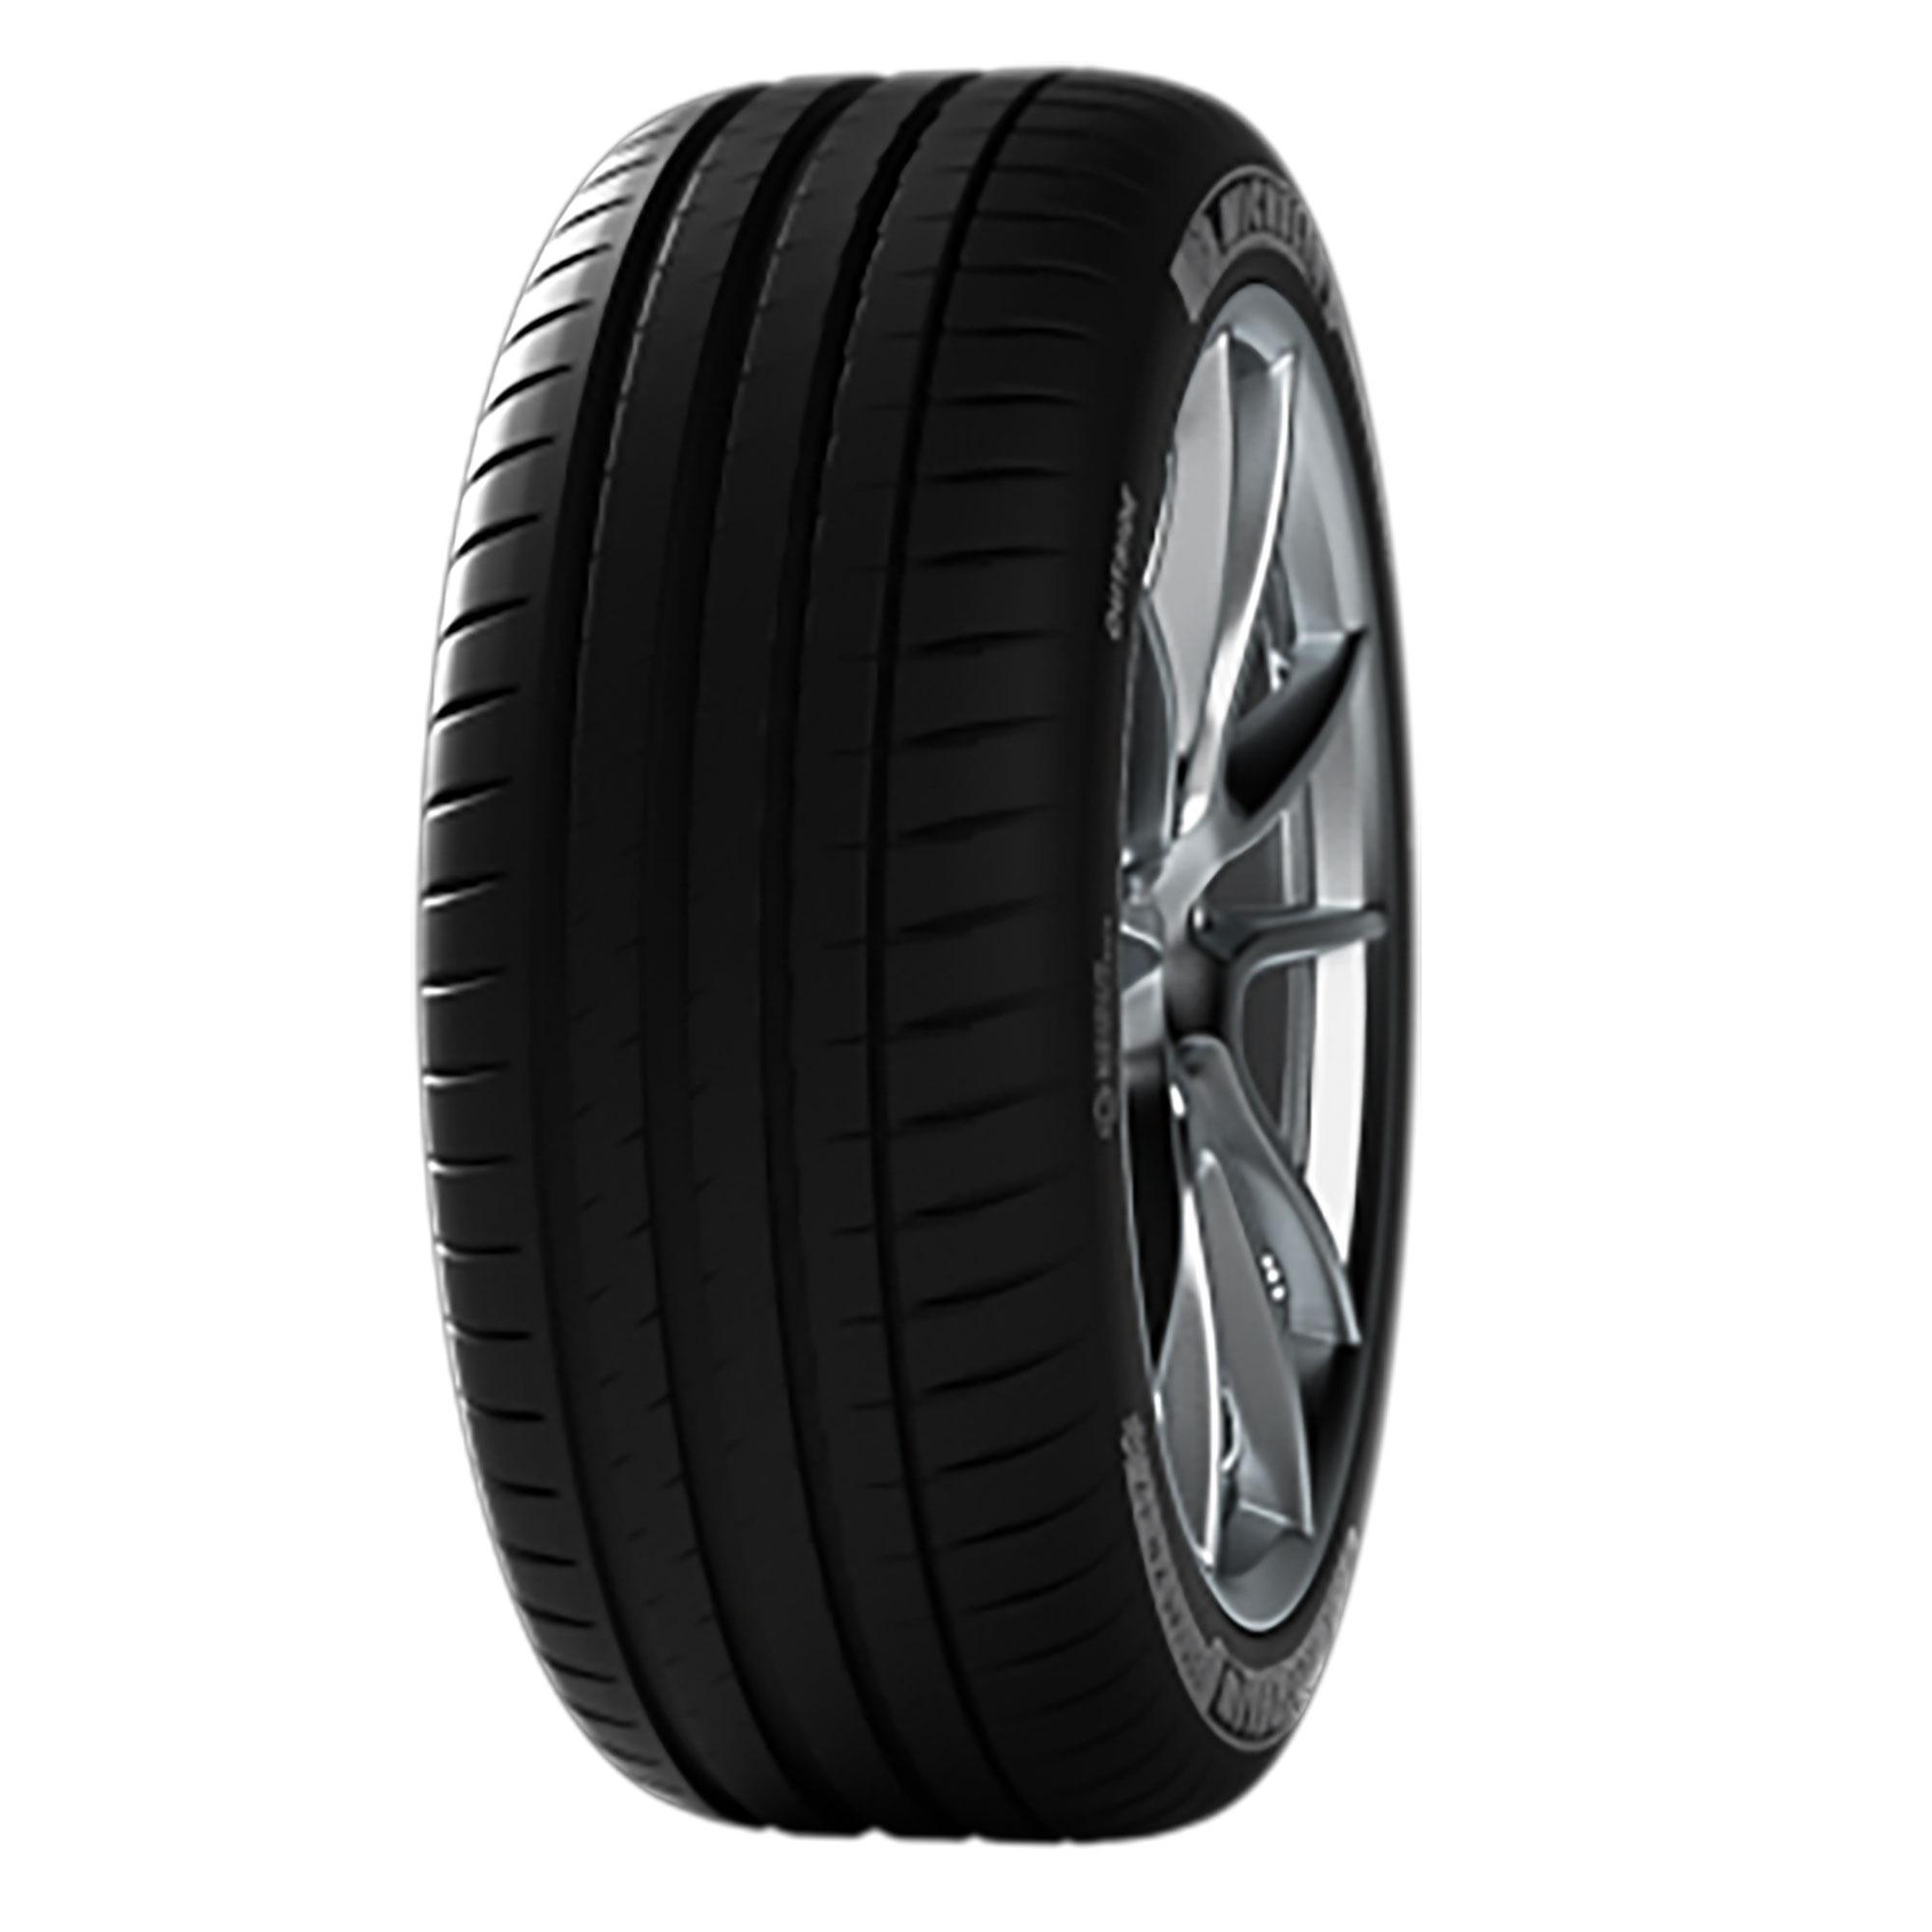 1 x 225 40 18 92w michelin pilot sport 4 performance road tyre extra load xl ebay. Black Bedroom Furniture Sets. Home Design Ideas